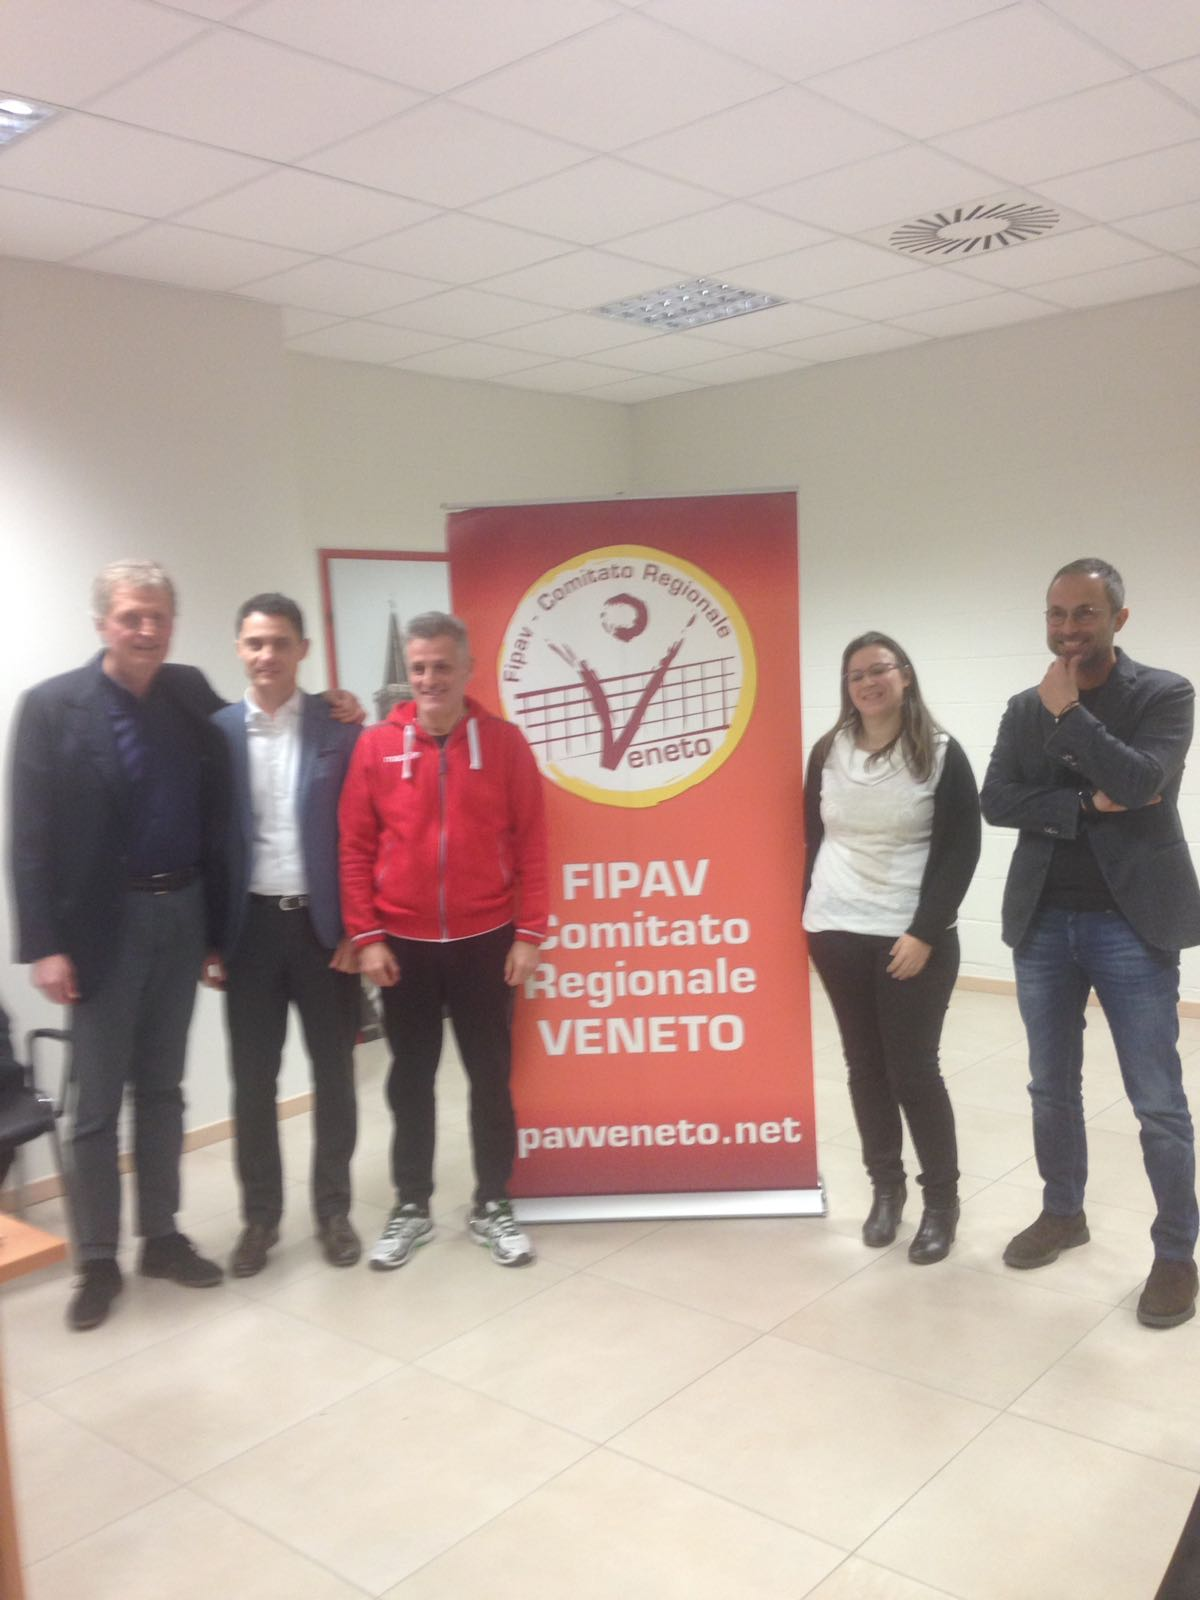 da destra, Leonardo Maran, Elena Viscardi, Marco Mencarelli, Andrea Puecher e Carlo Spillare